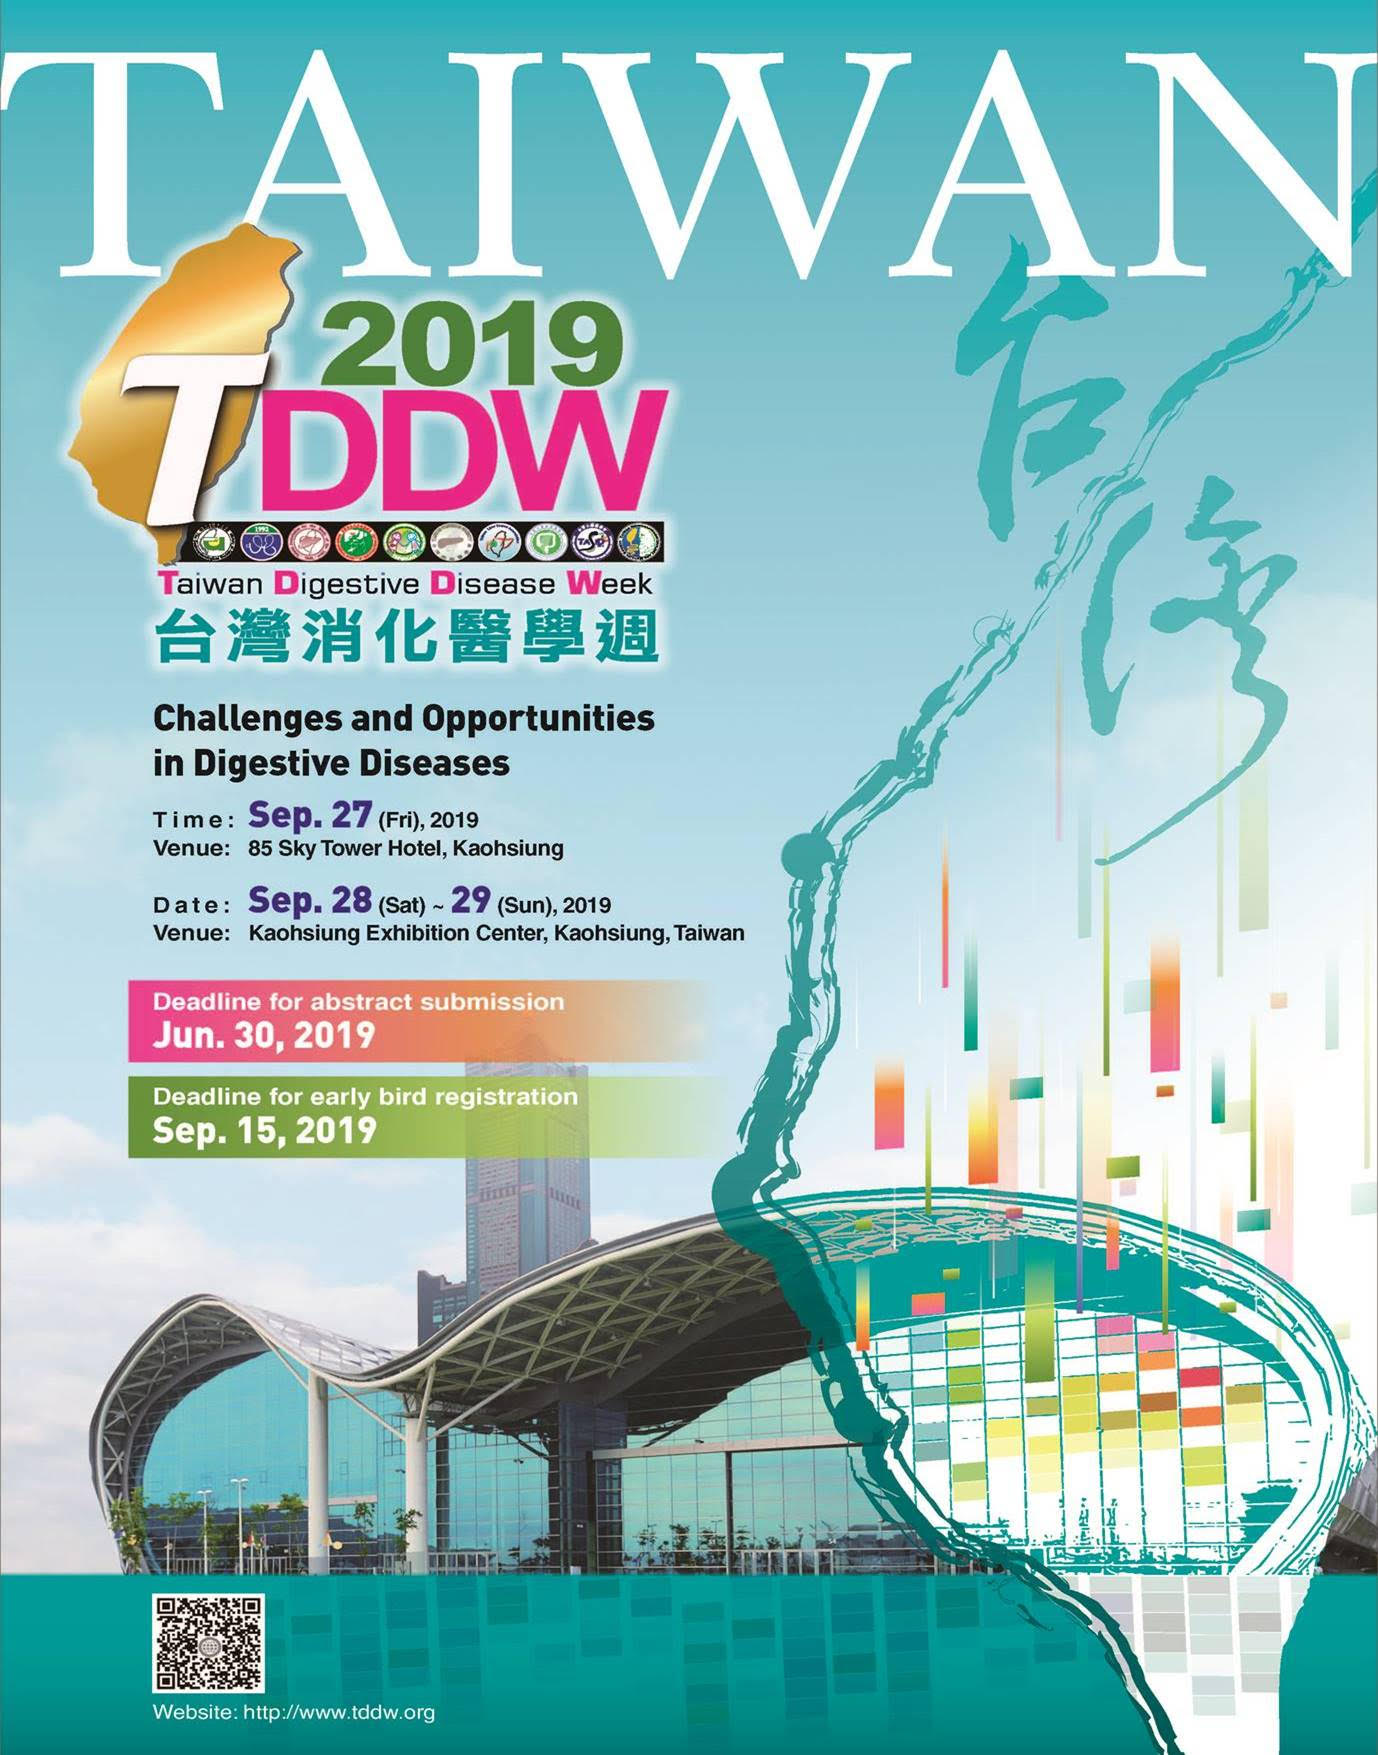 Taiwan Digestive Disease Week 2019 (TDDW 2019)